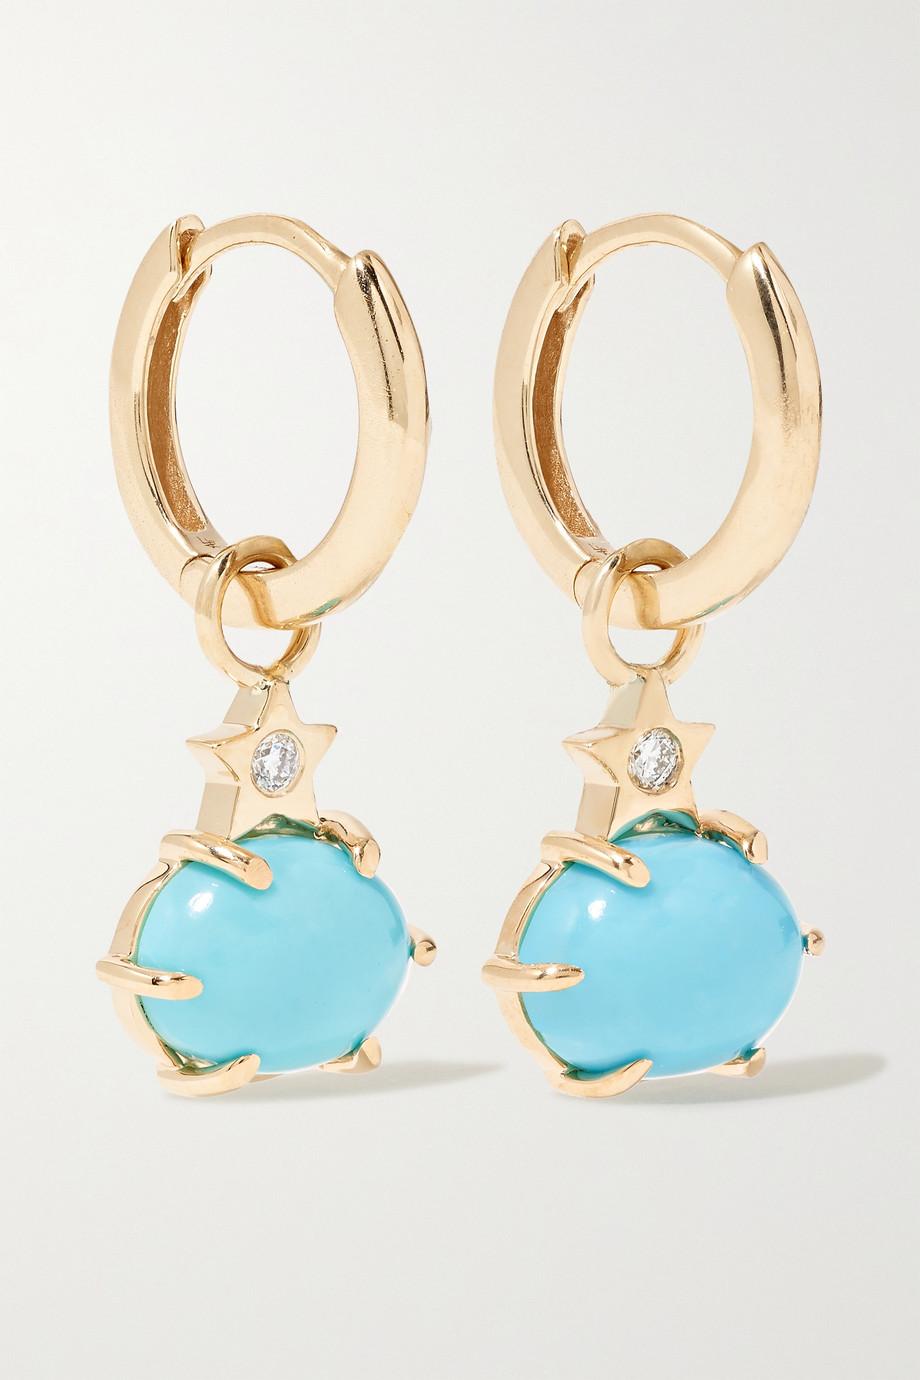 Andrea Fohrman Boucles d'oreilles en or 14 carats, turquoises et diamants Mini Cosmo